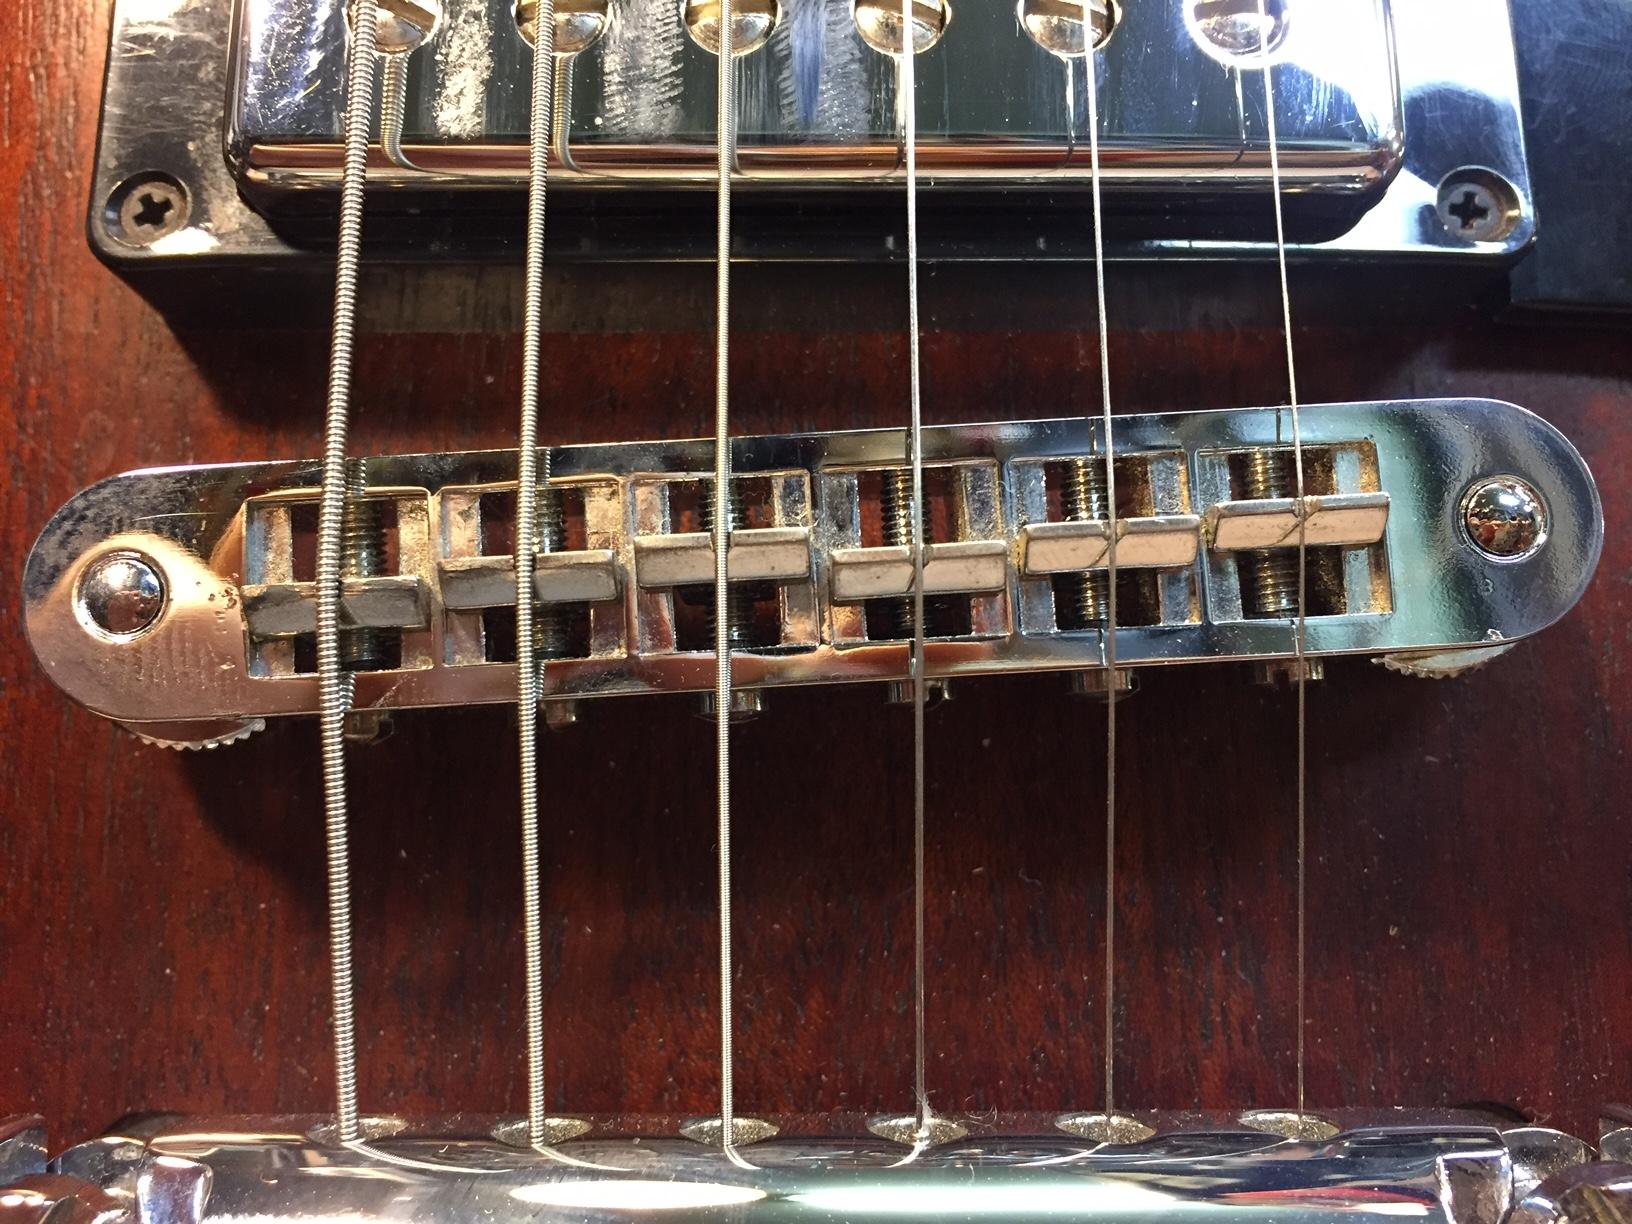 intonation lil trees guitars. Black Bedroom Furniture Sets. Home Design Ideas